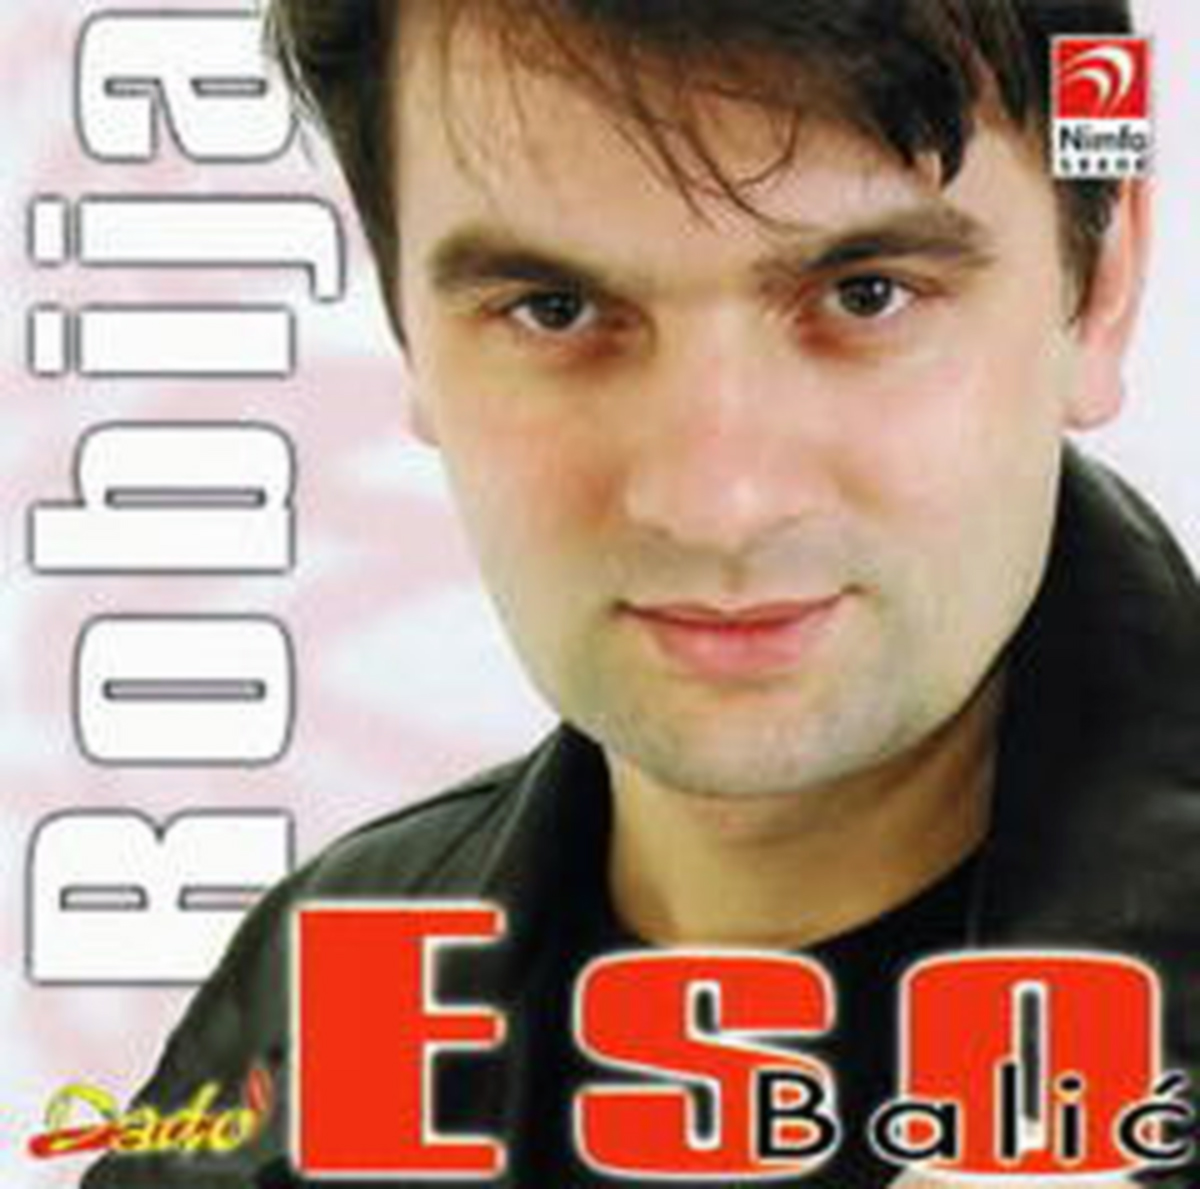 Eso Balic - Diskografija (1997-2013)  2001-Robija